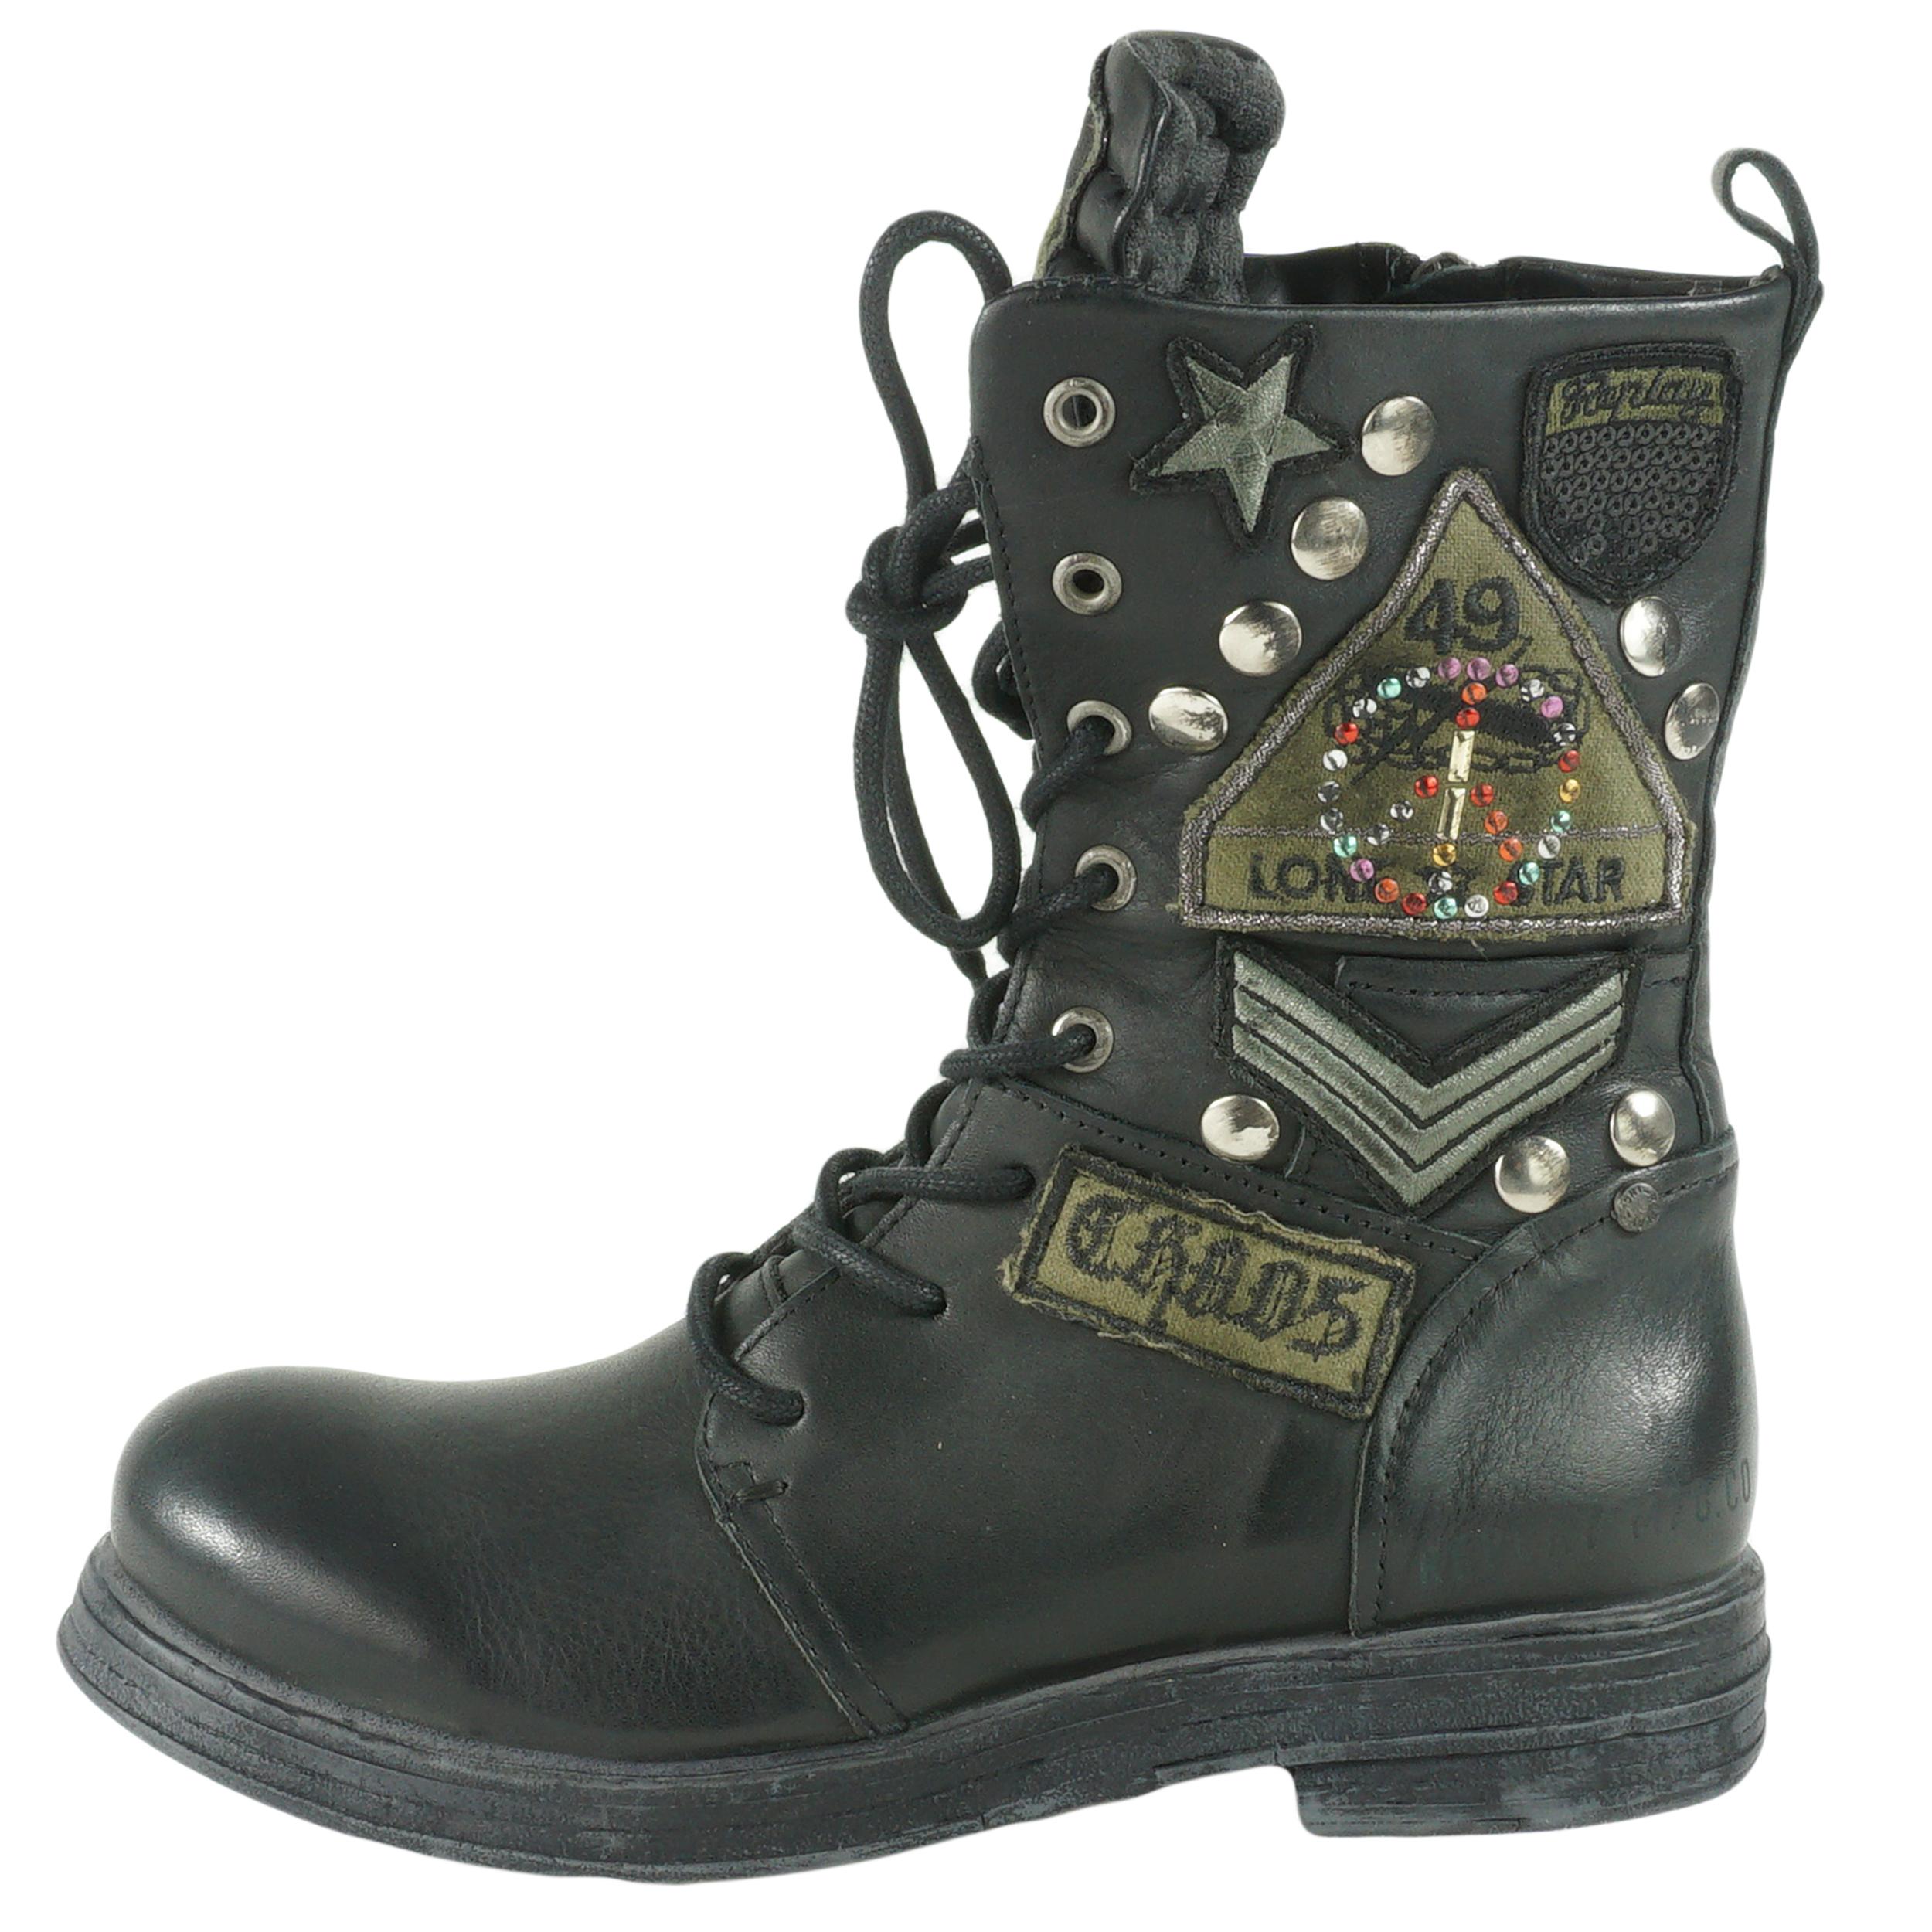 Replay Damen Biker Boots RL260045L Stiefel Schuhe ...